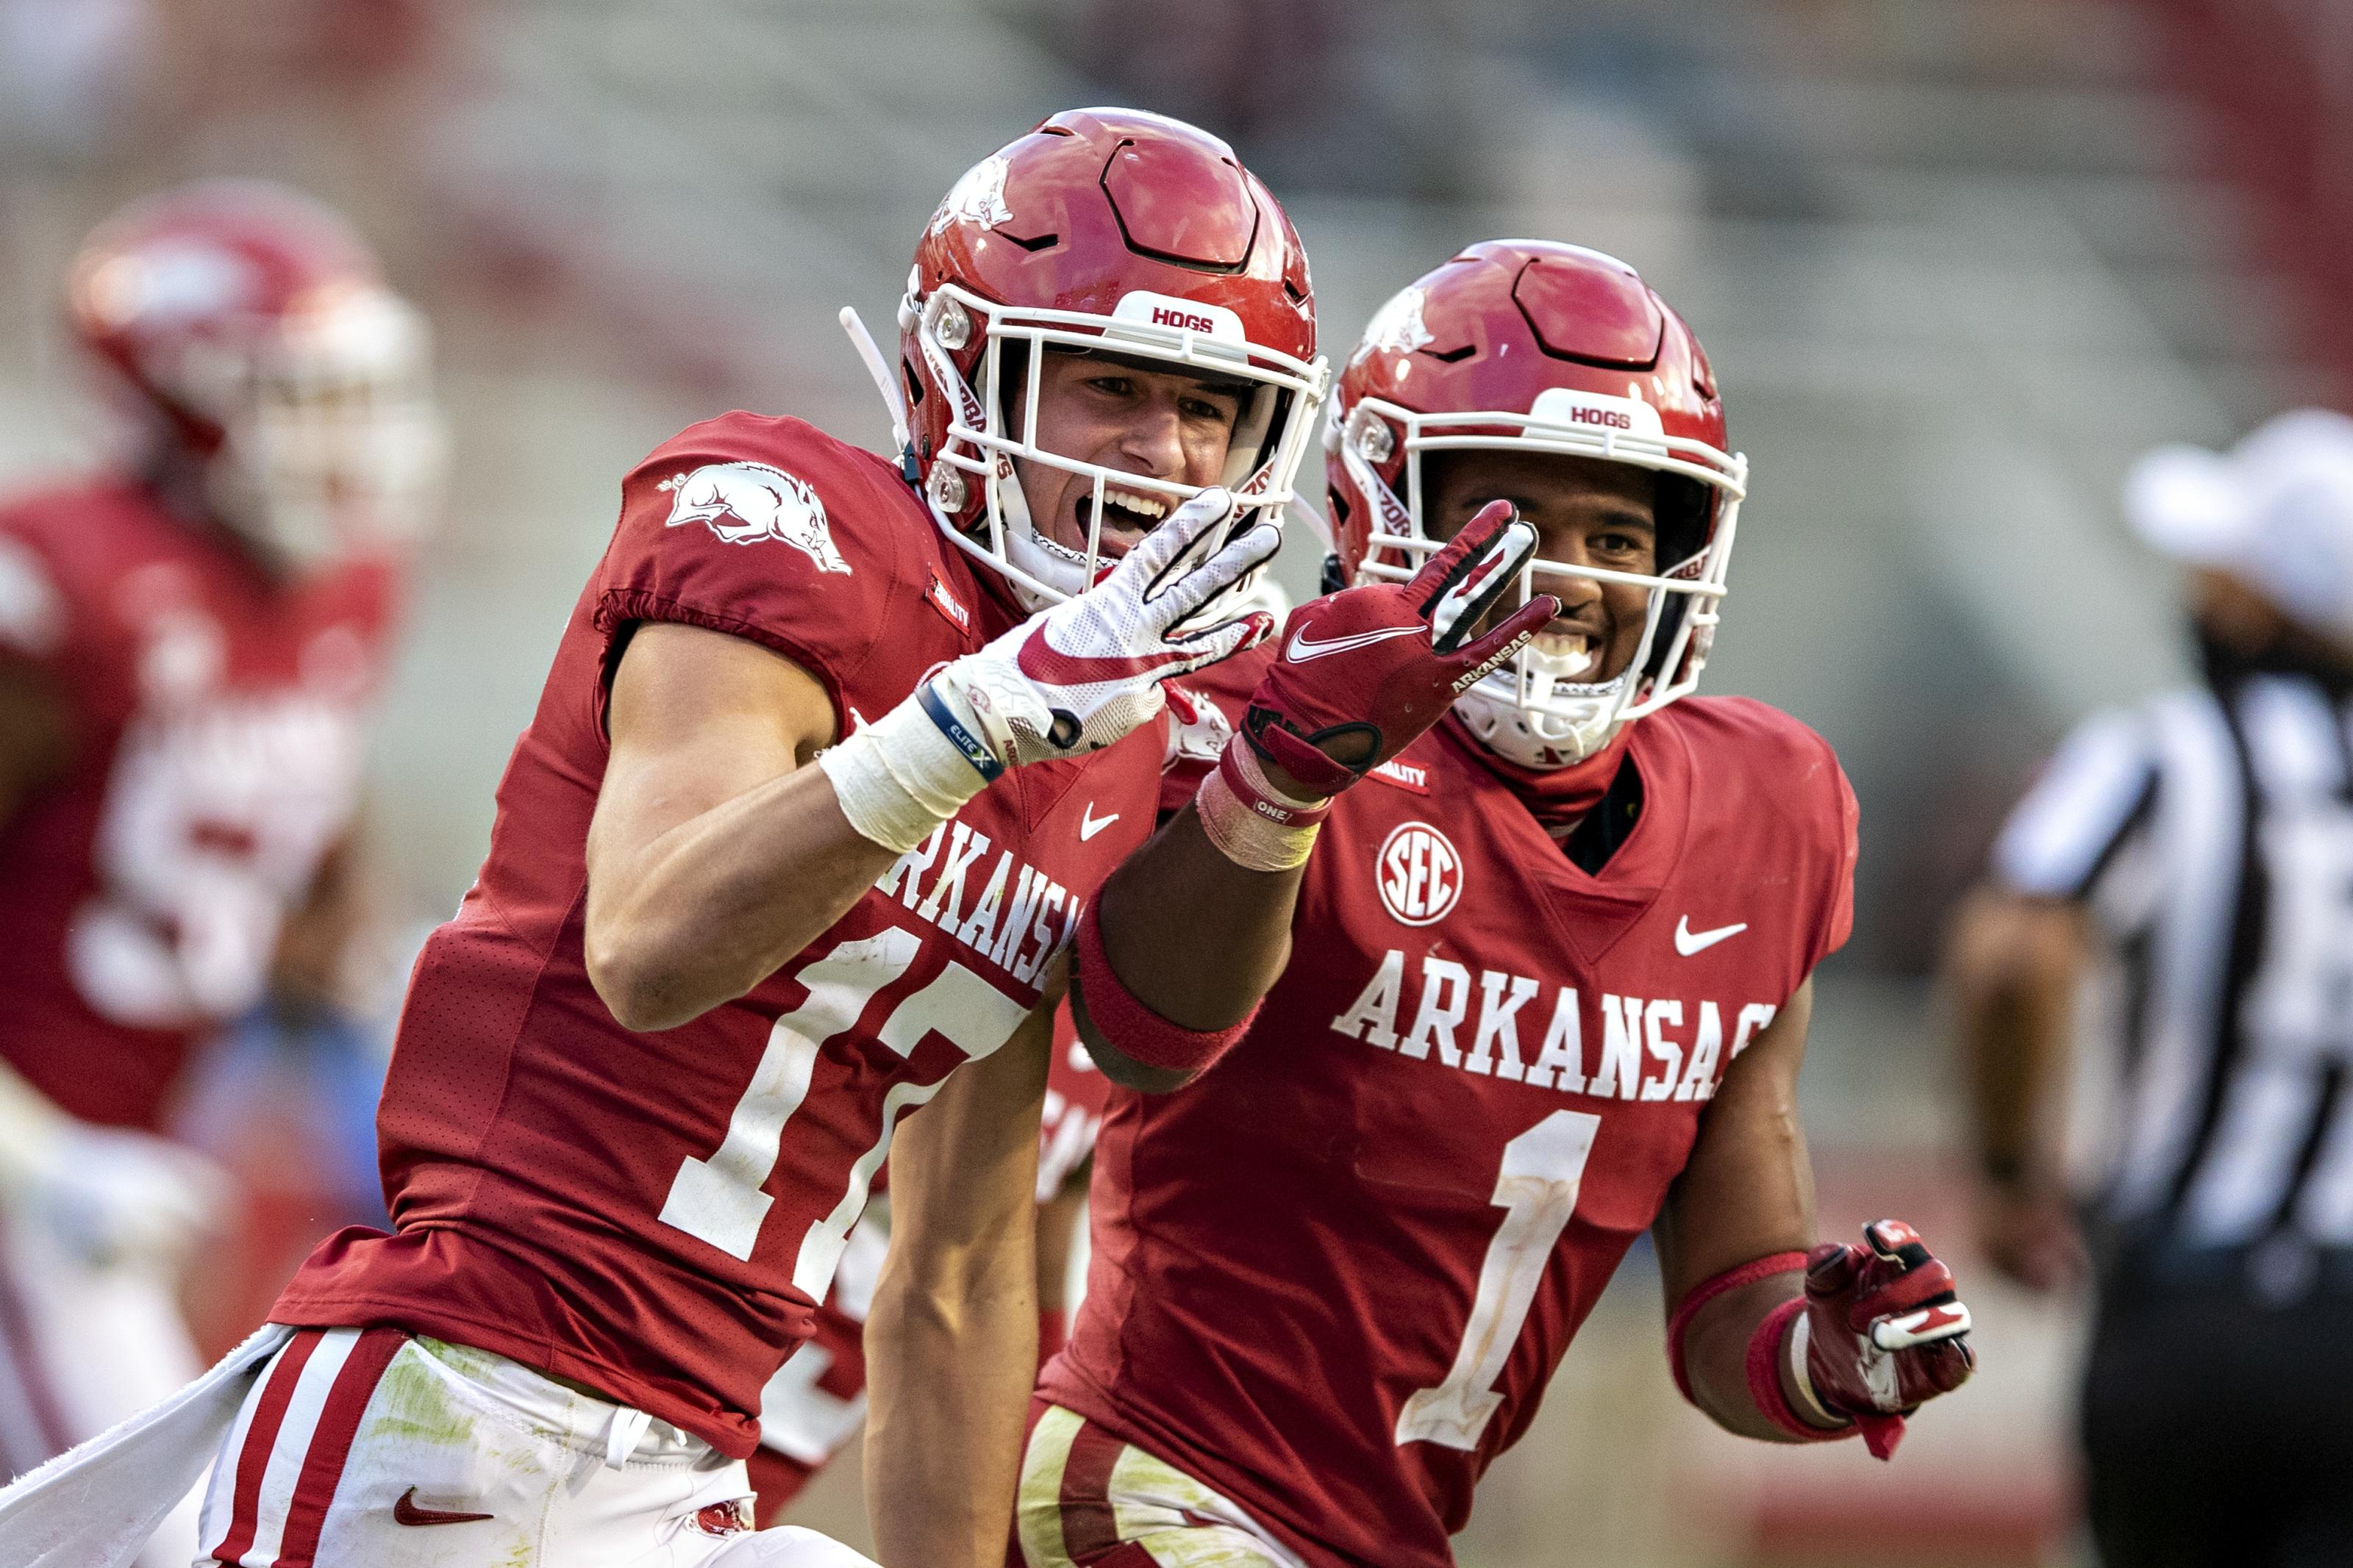 Arkansas Football Hudson Clark Goes From Walk on To Hero Vs Ole Miss